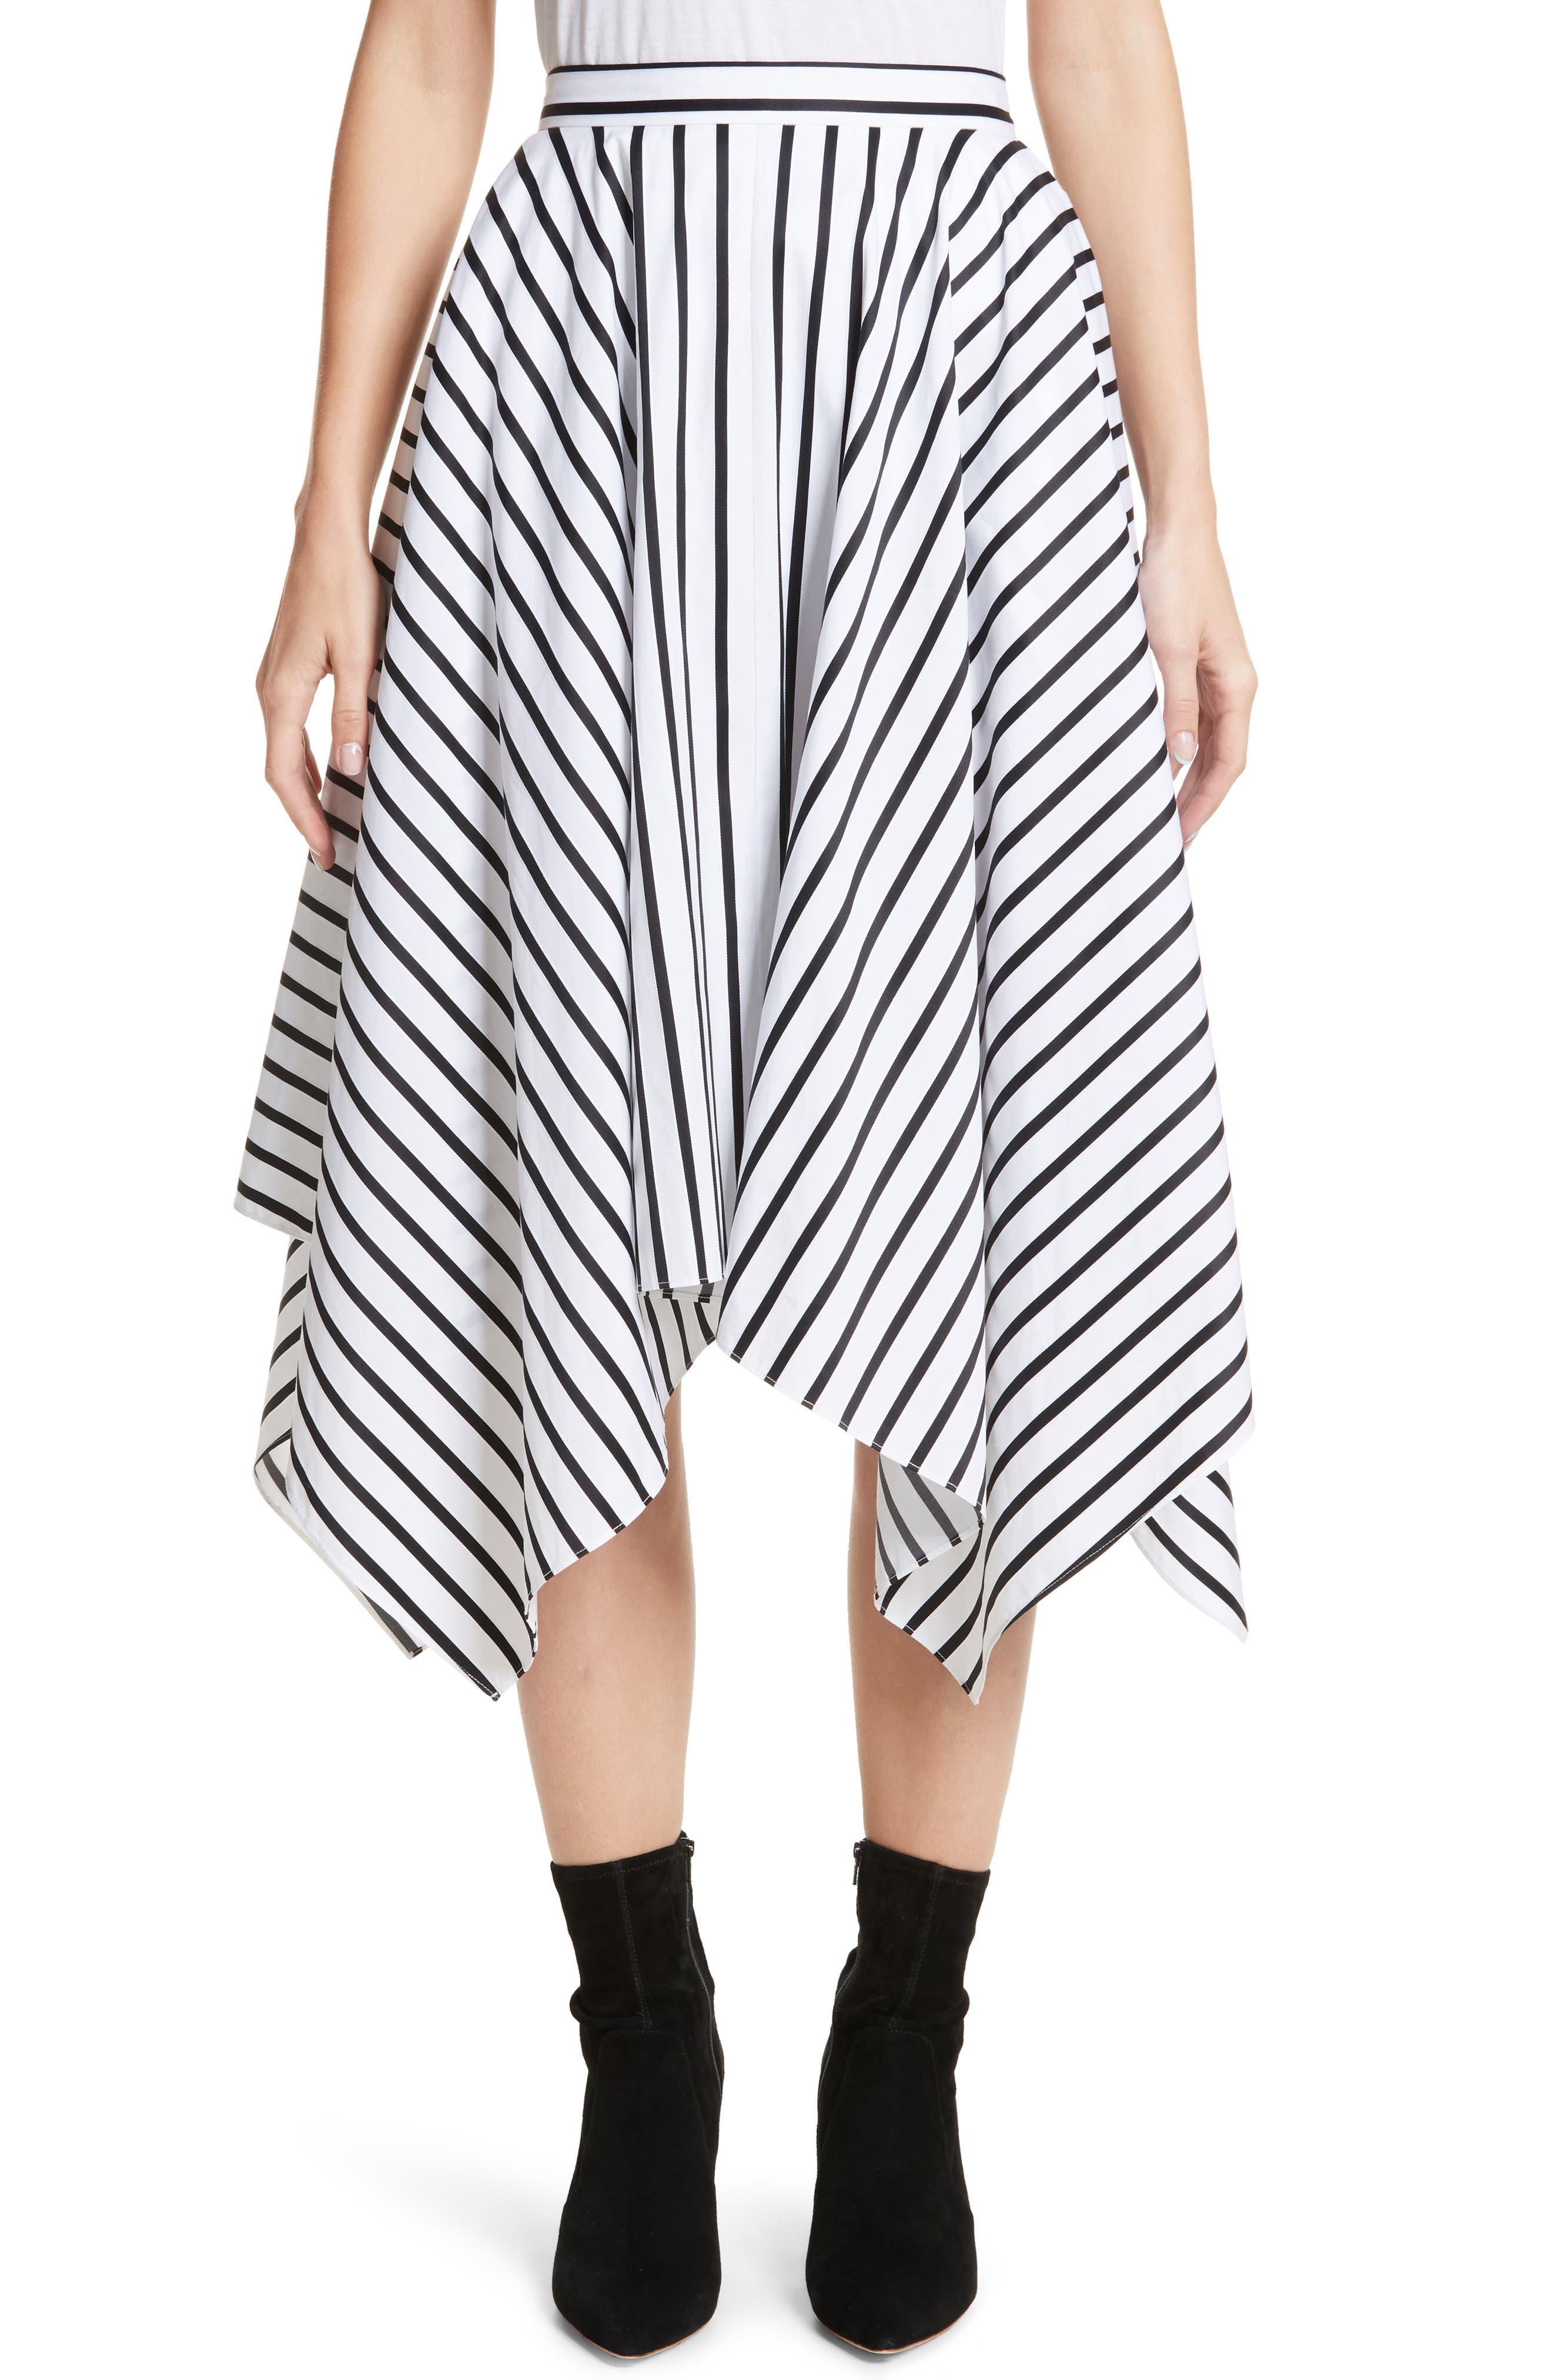 Alternate Image 1 Selected - Adam Lippes Stripe Cotton Asymmetrical Skirt